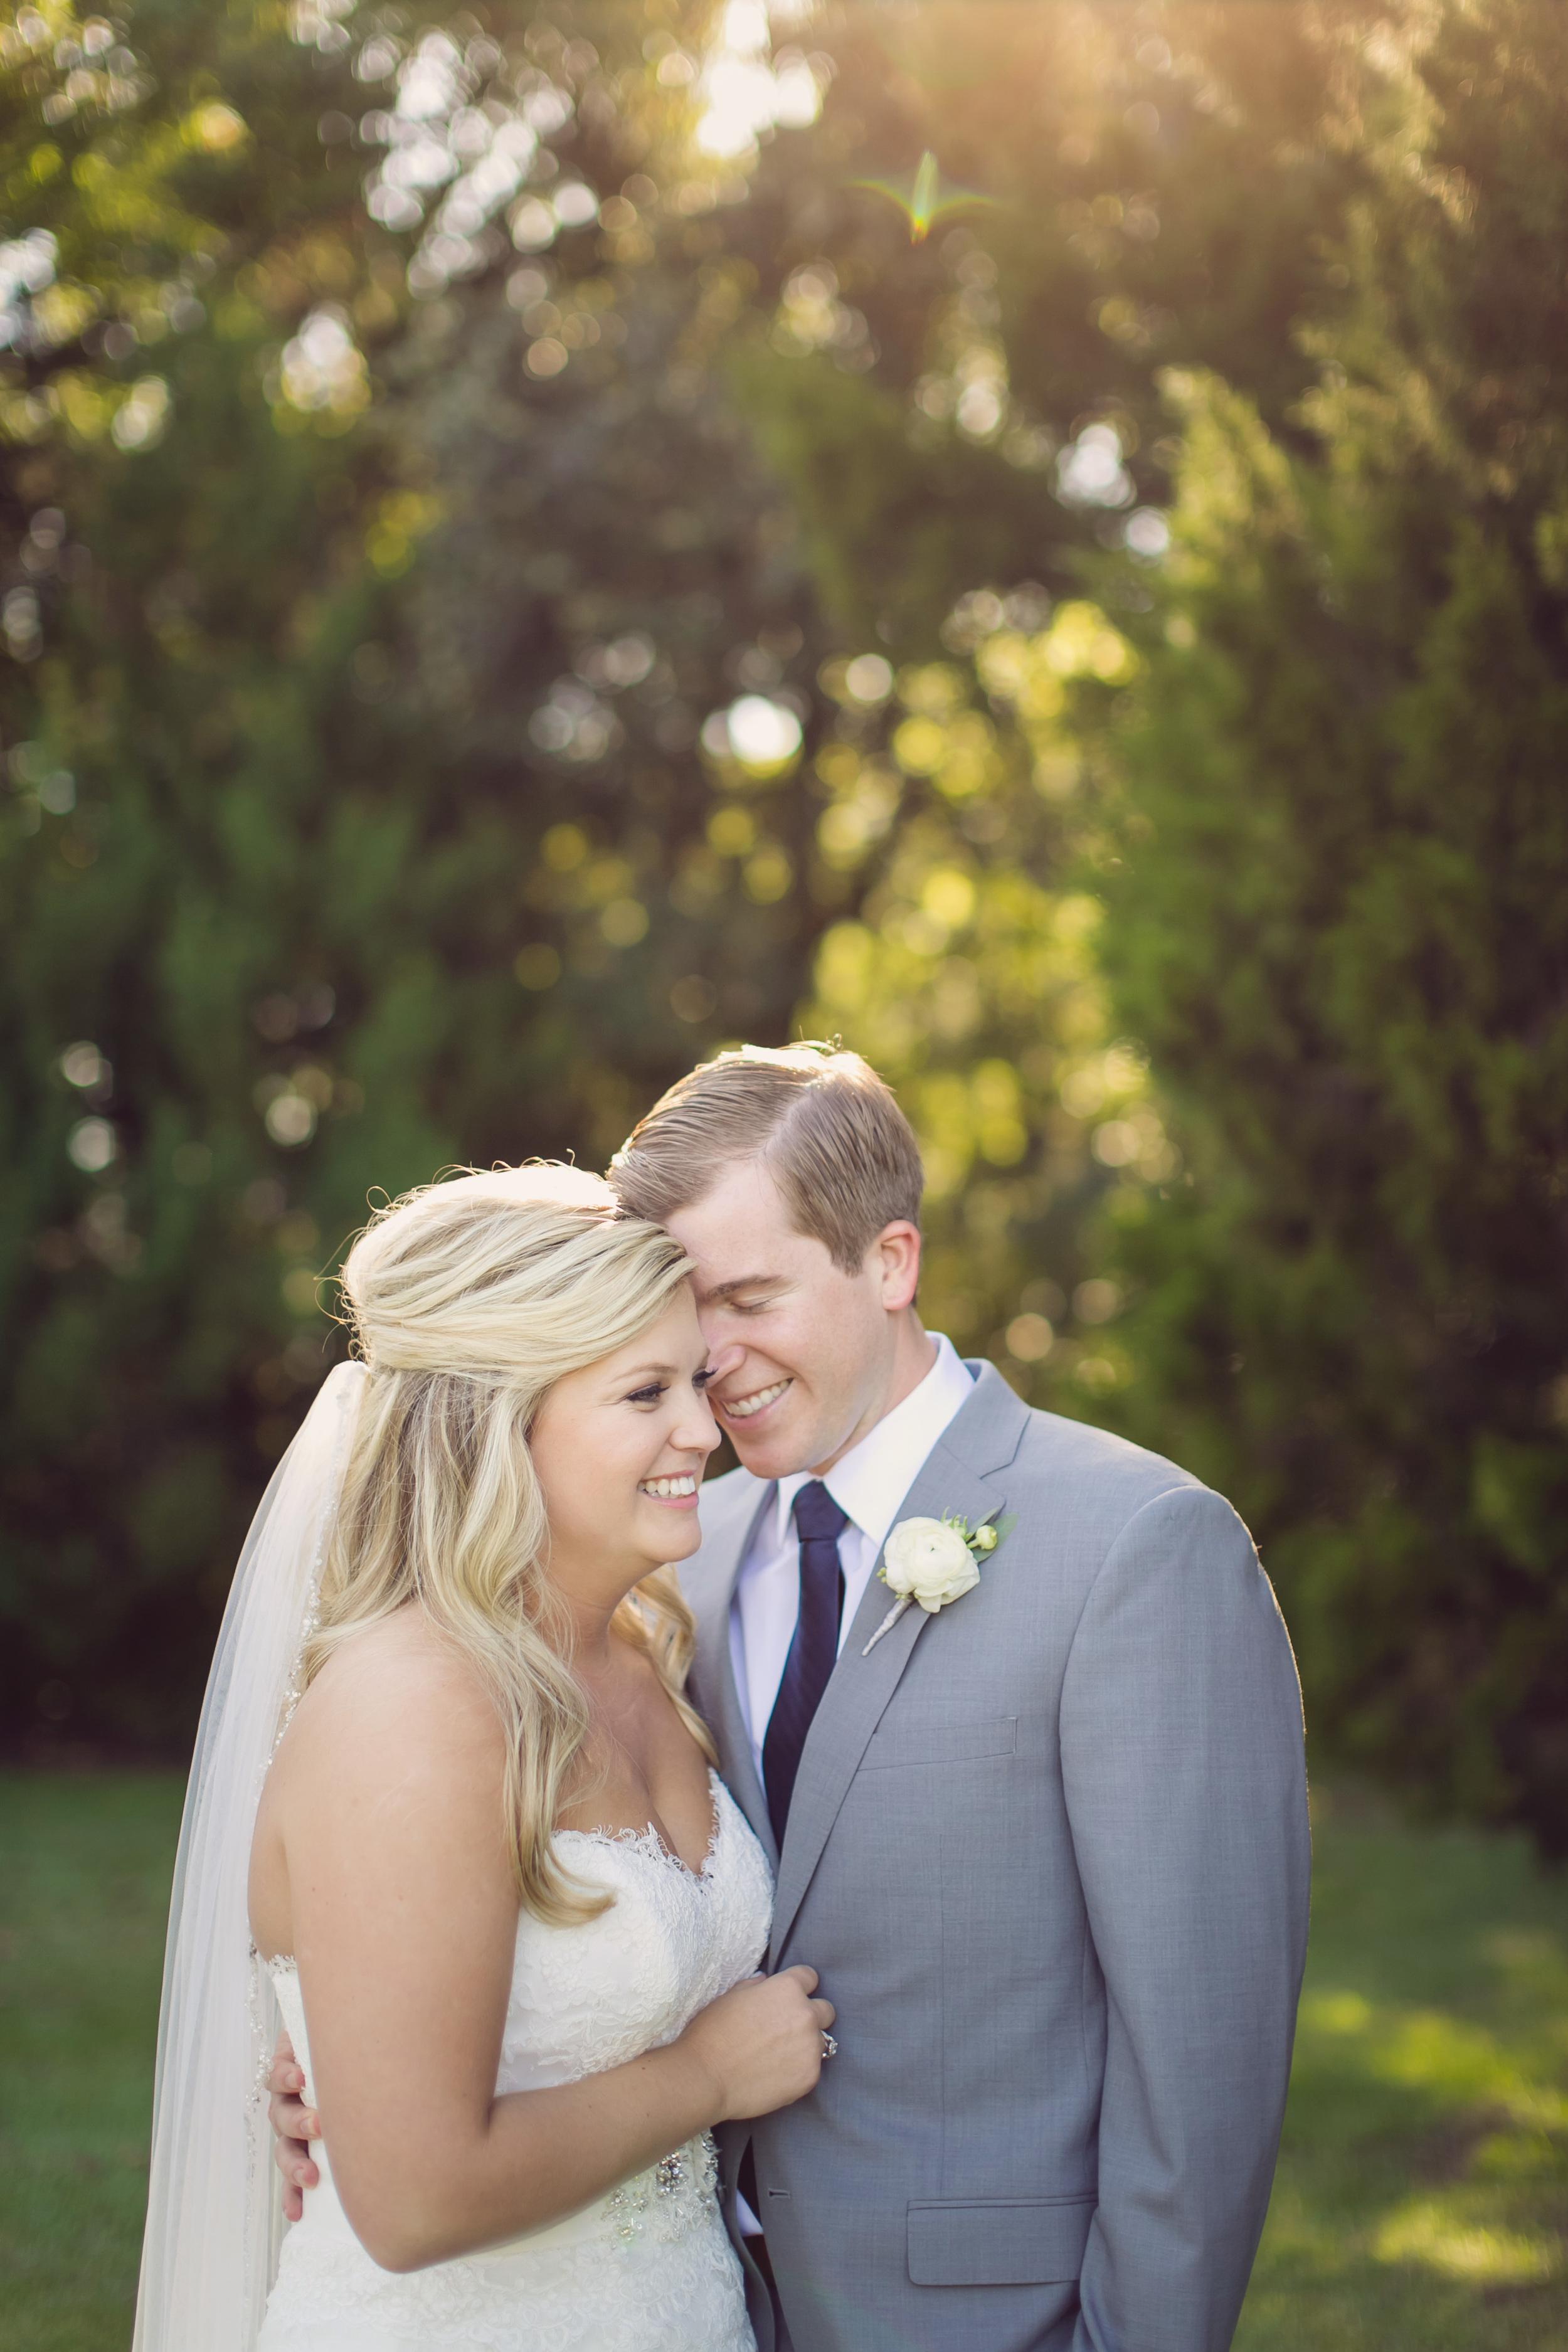 Heather + Andy's Lowcountry wedding in Charleston, South Carolina